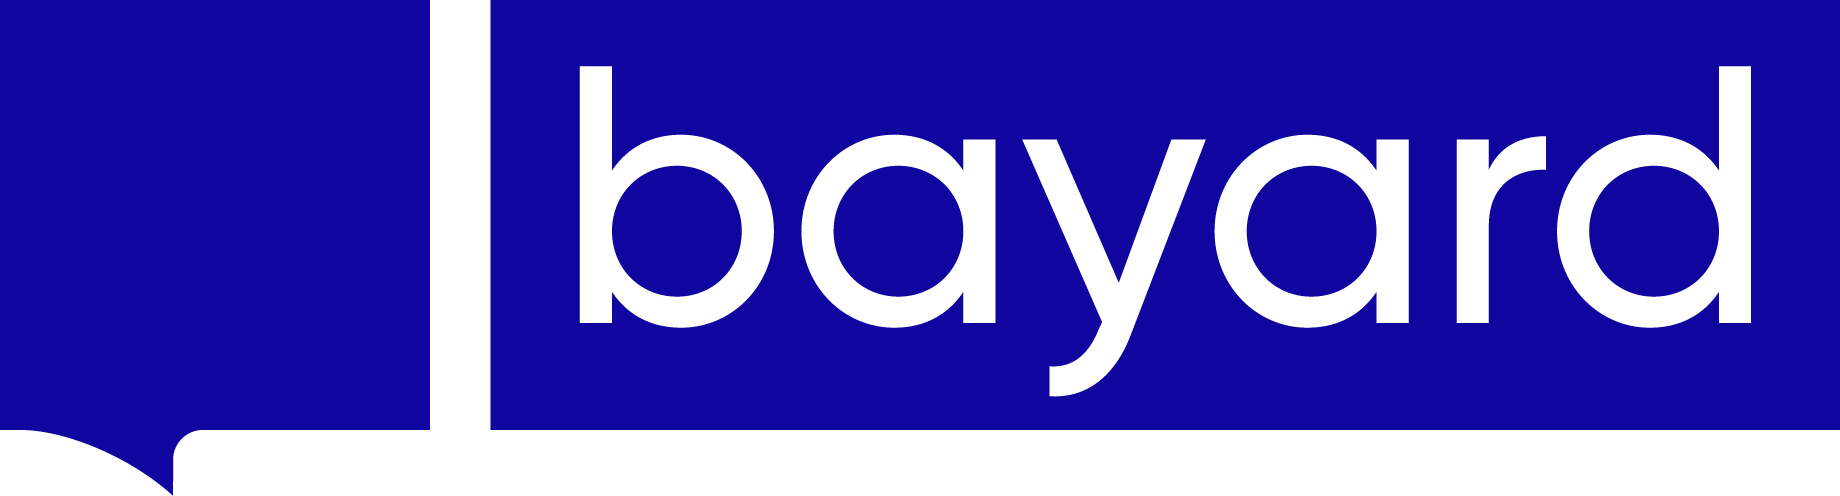 logo Bayard instit